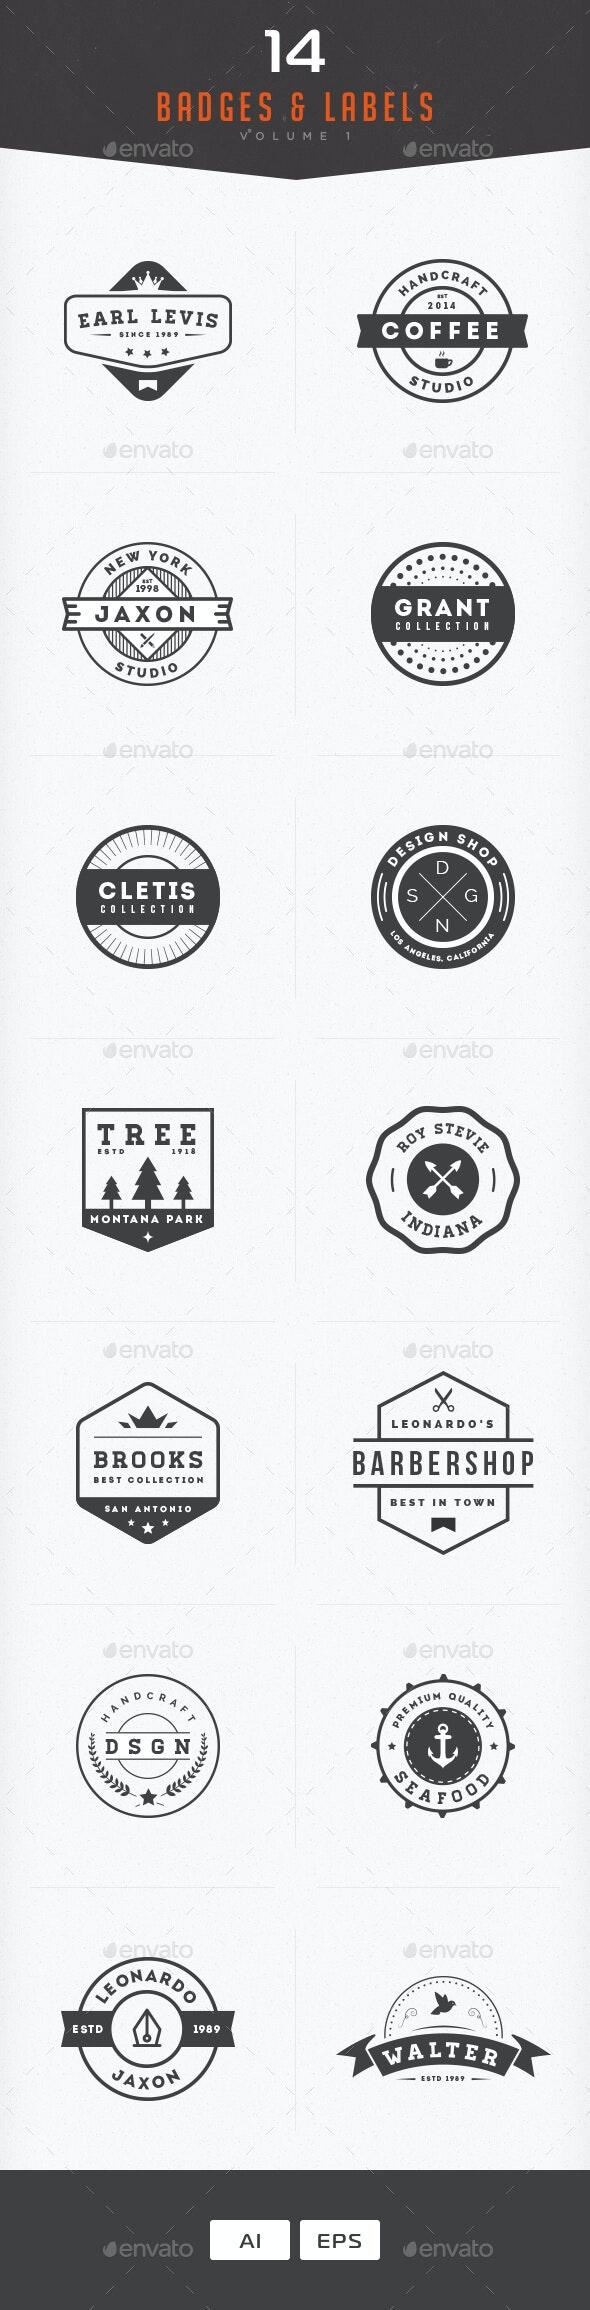 Badges & Labels Vol 1 - Badges & Stickers Web Elements